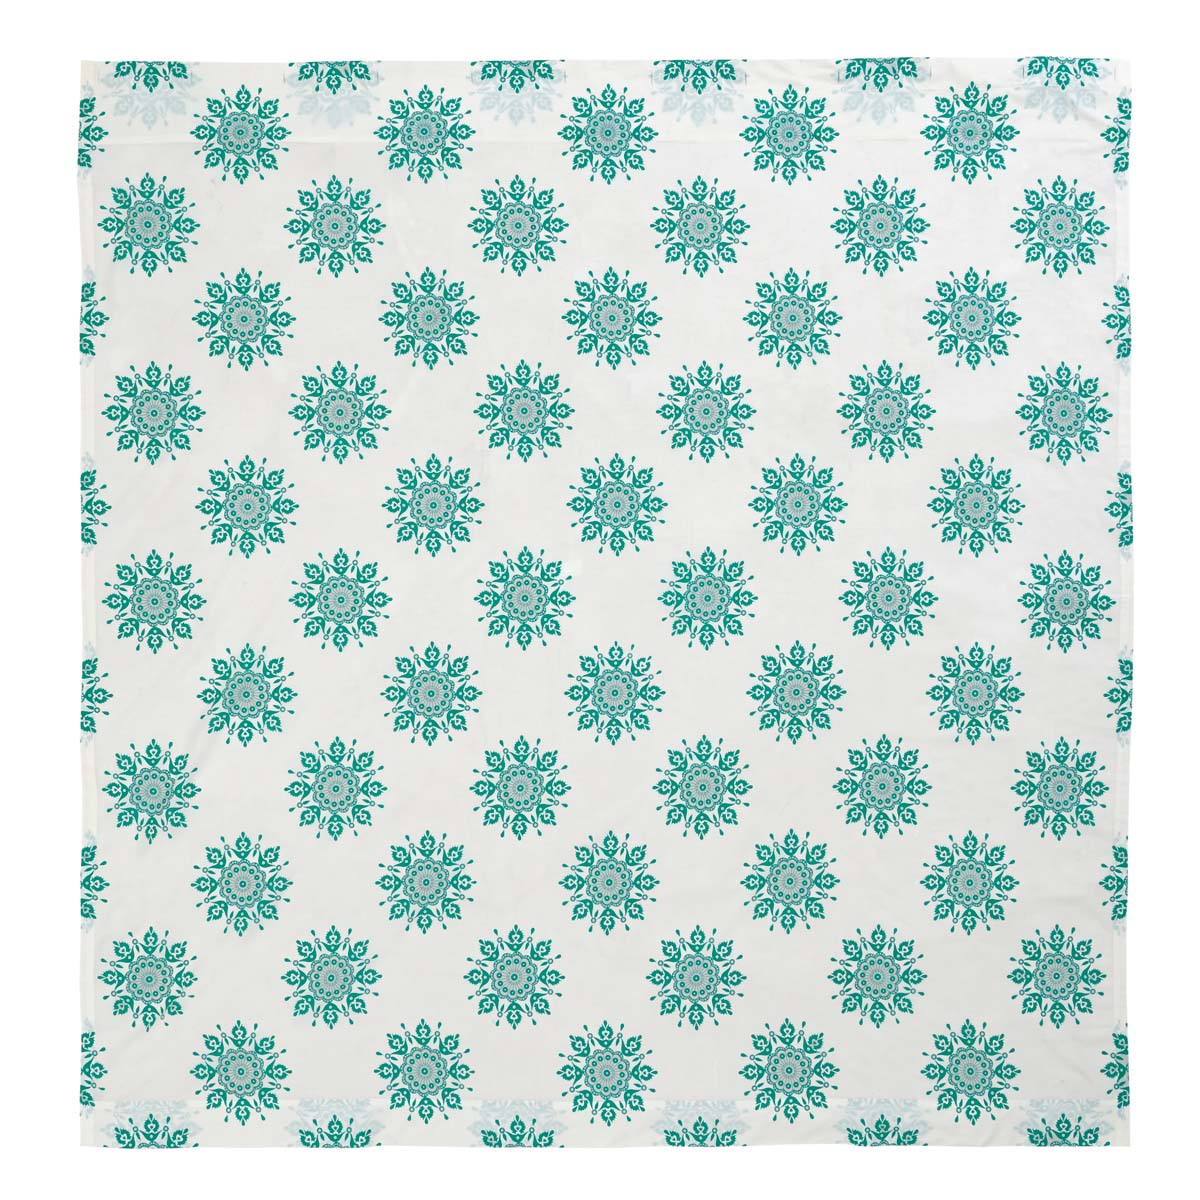 Mariposa Turquoise Shower Curtain 72x72